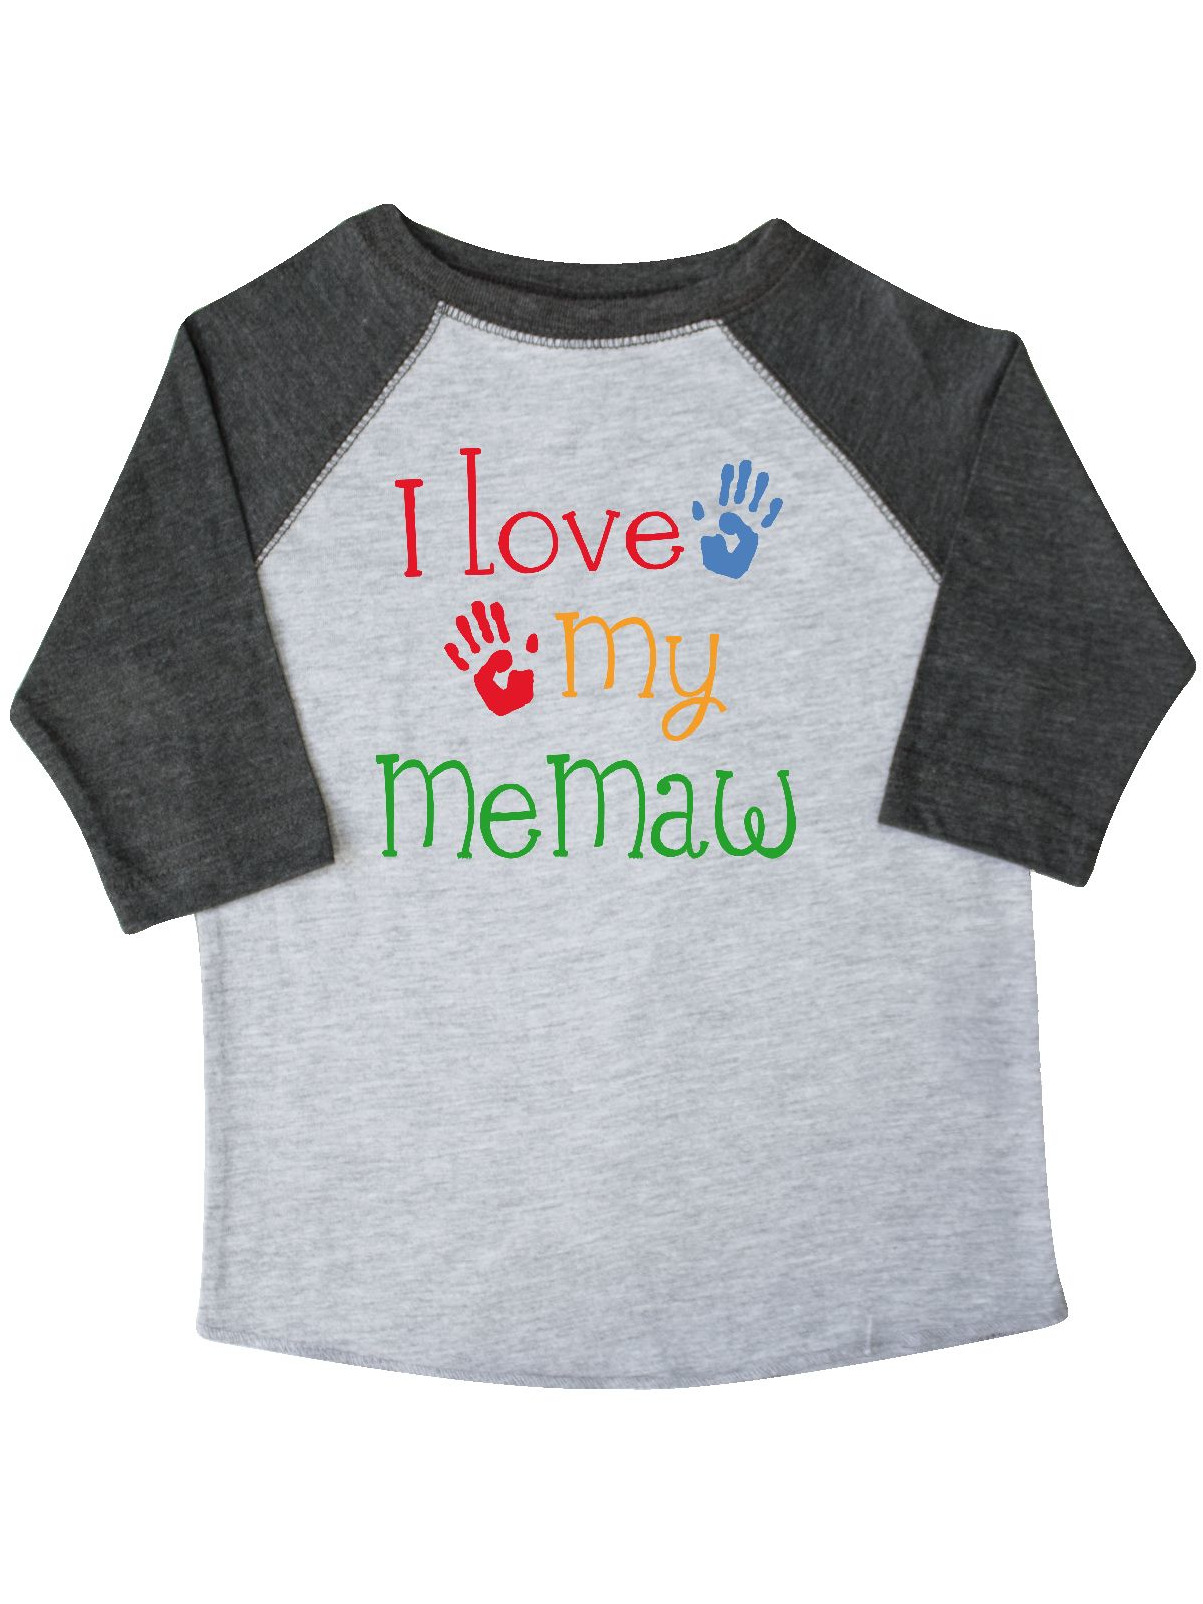 I Love My MeMaw Toddler T-Shirt